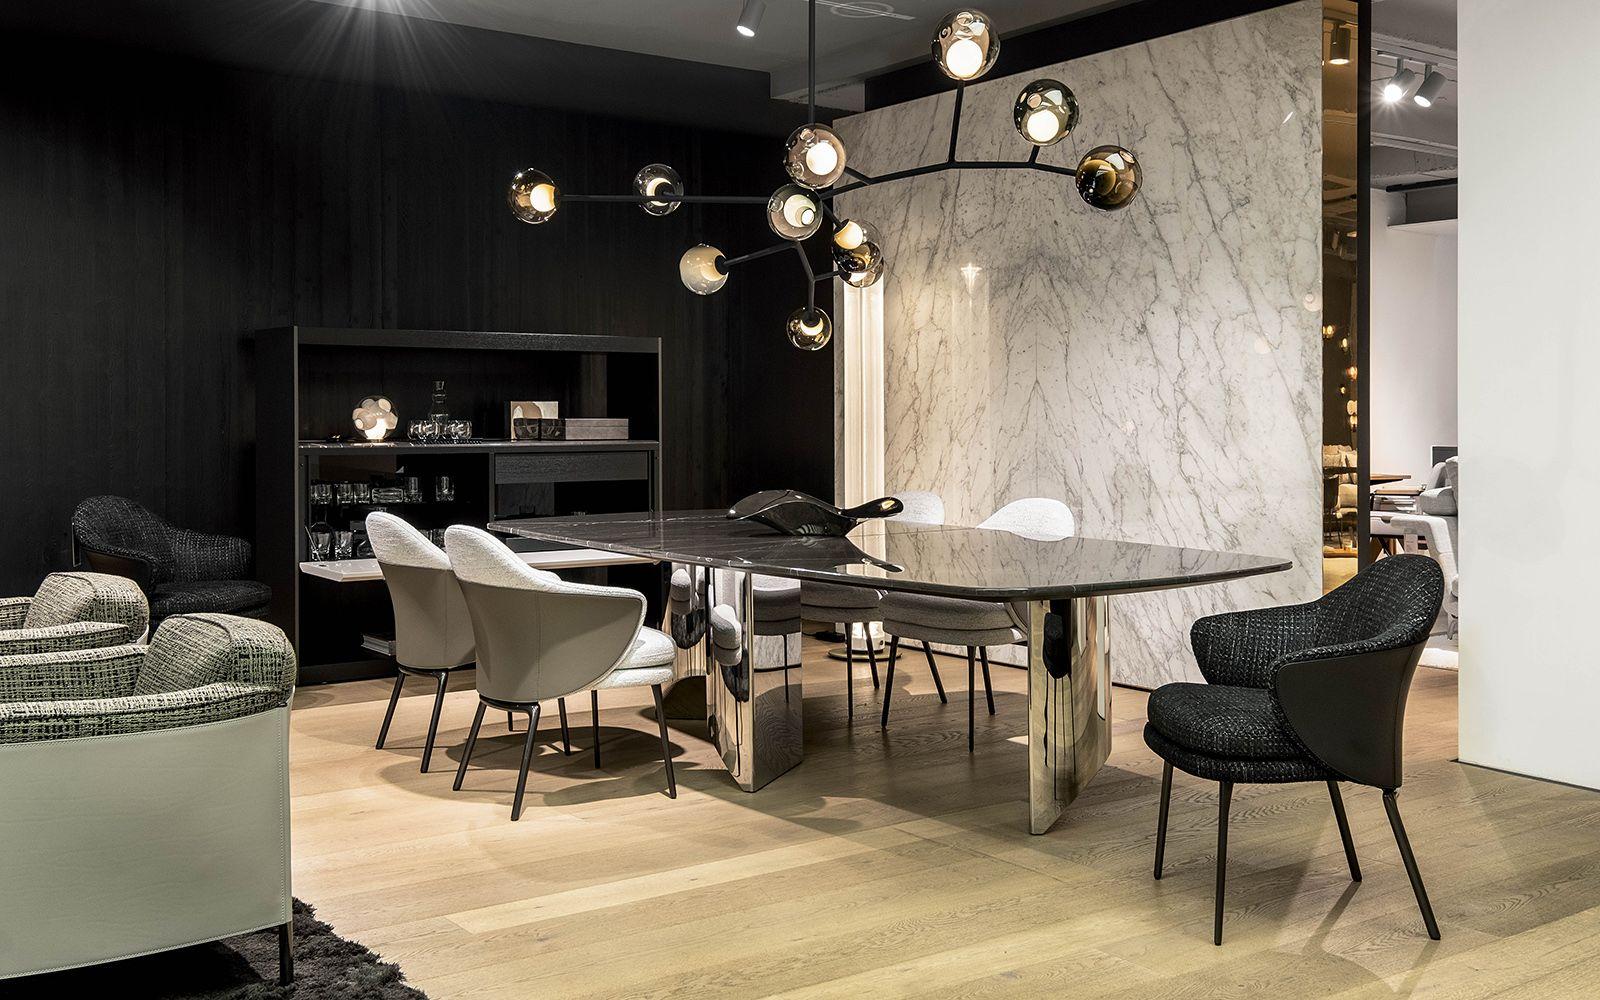 Pesch International Interiors Wedge Dining Table Nendo Design Angie Dining Chair Gamfratesi Design Minot In 2020 Luxury Interior Dining Table Chairs Interior